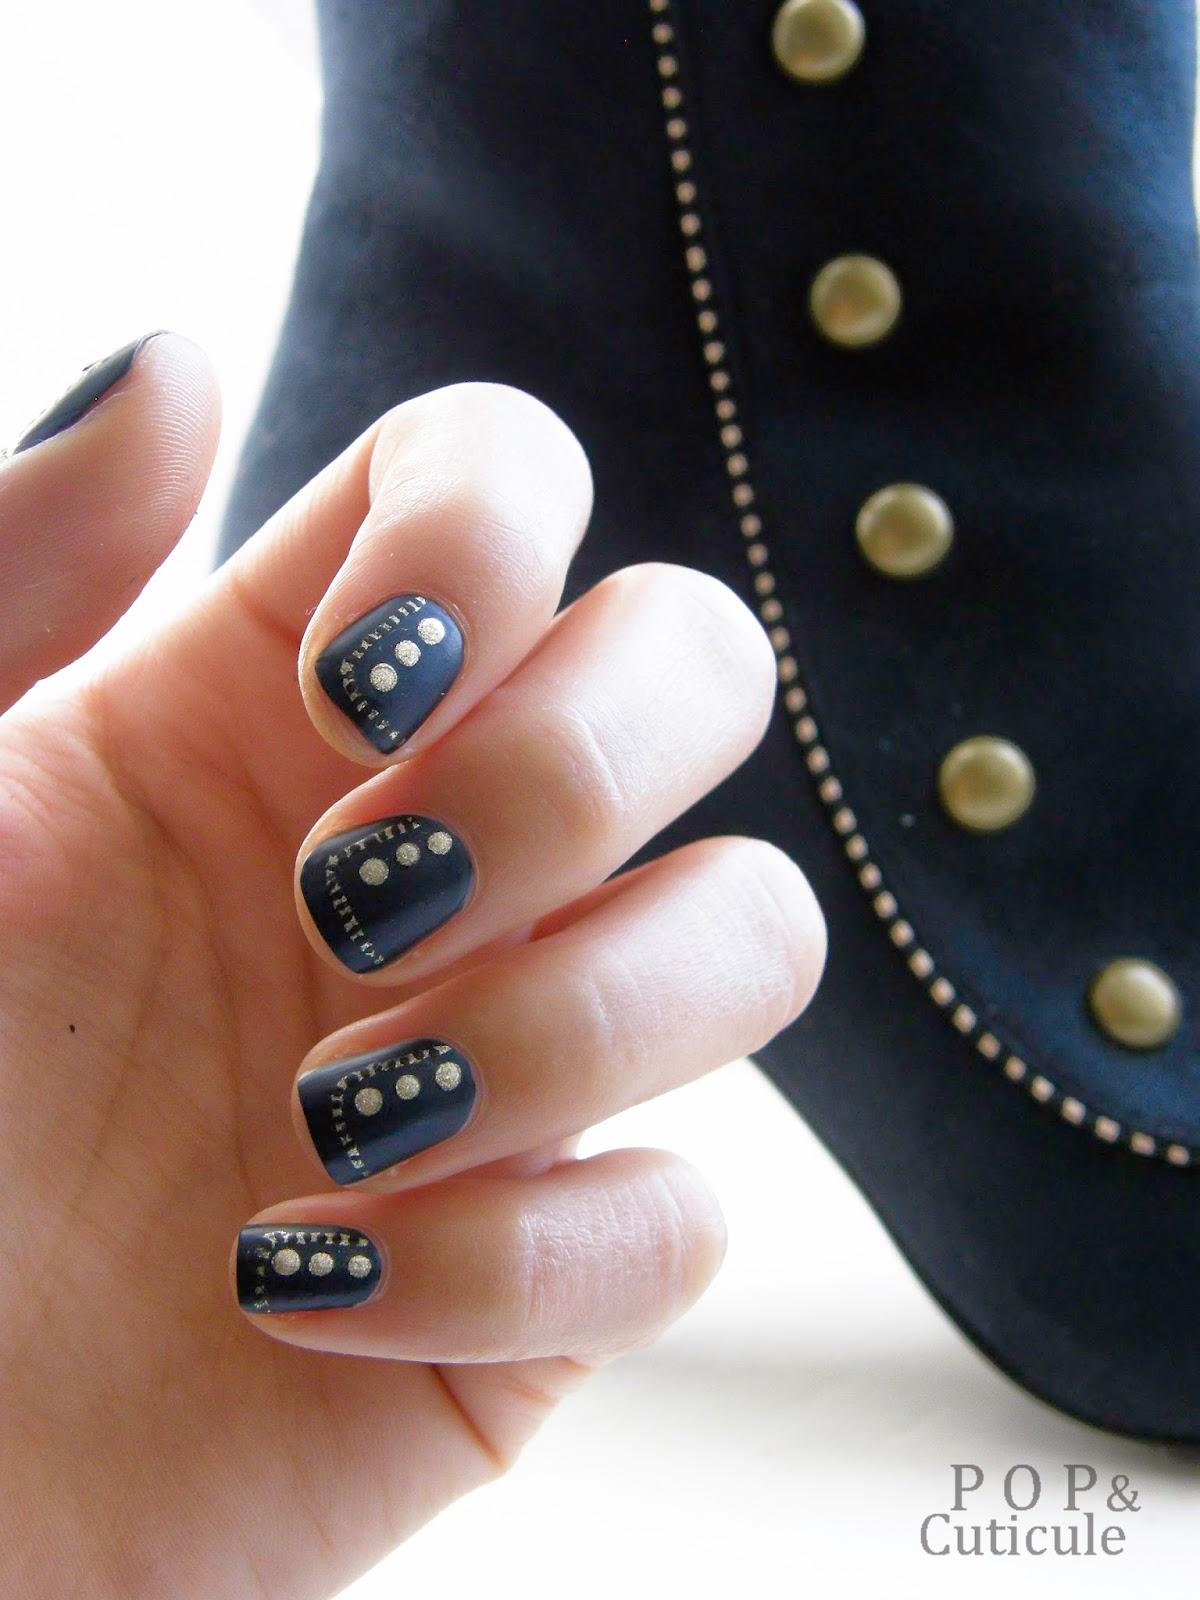 Pop & Cuticule nail art gold bleu marine or